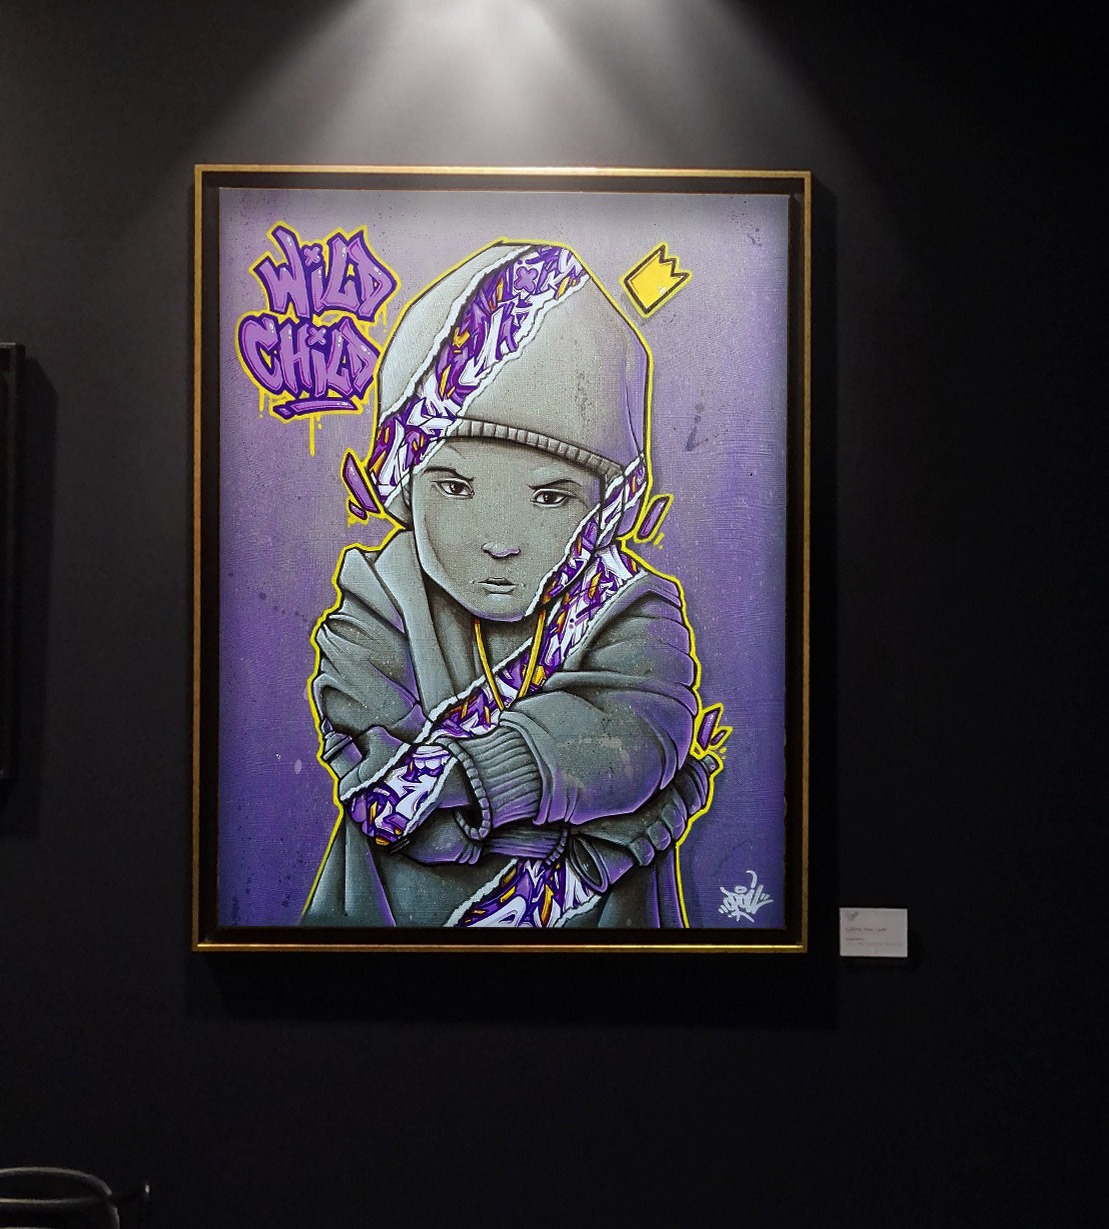 OPOIL Wild child 61x50cm Galerie Don Carli